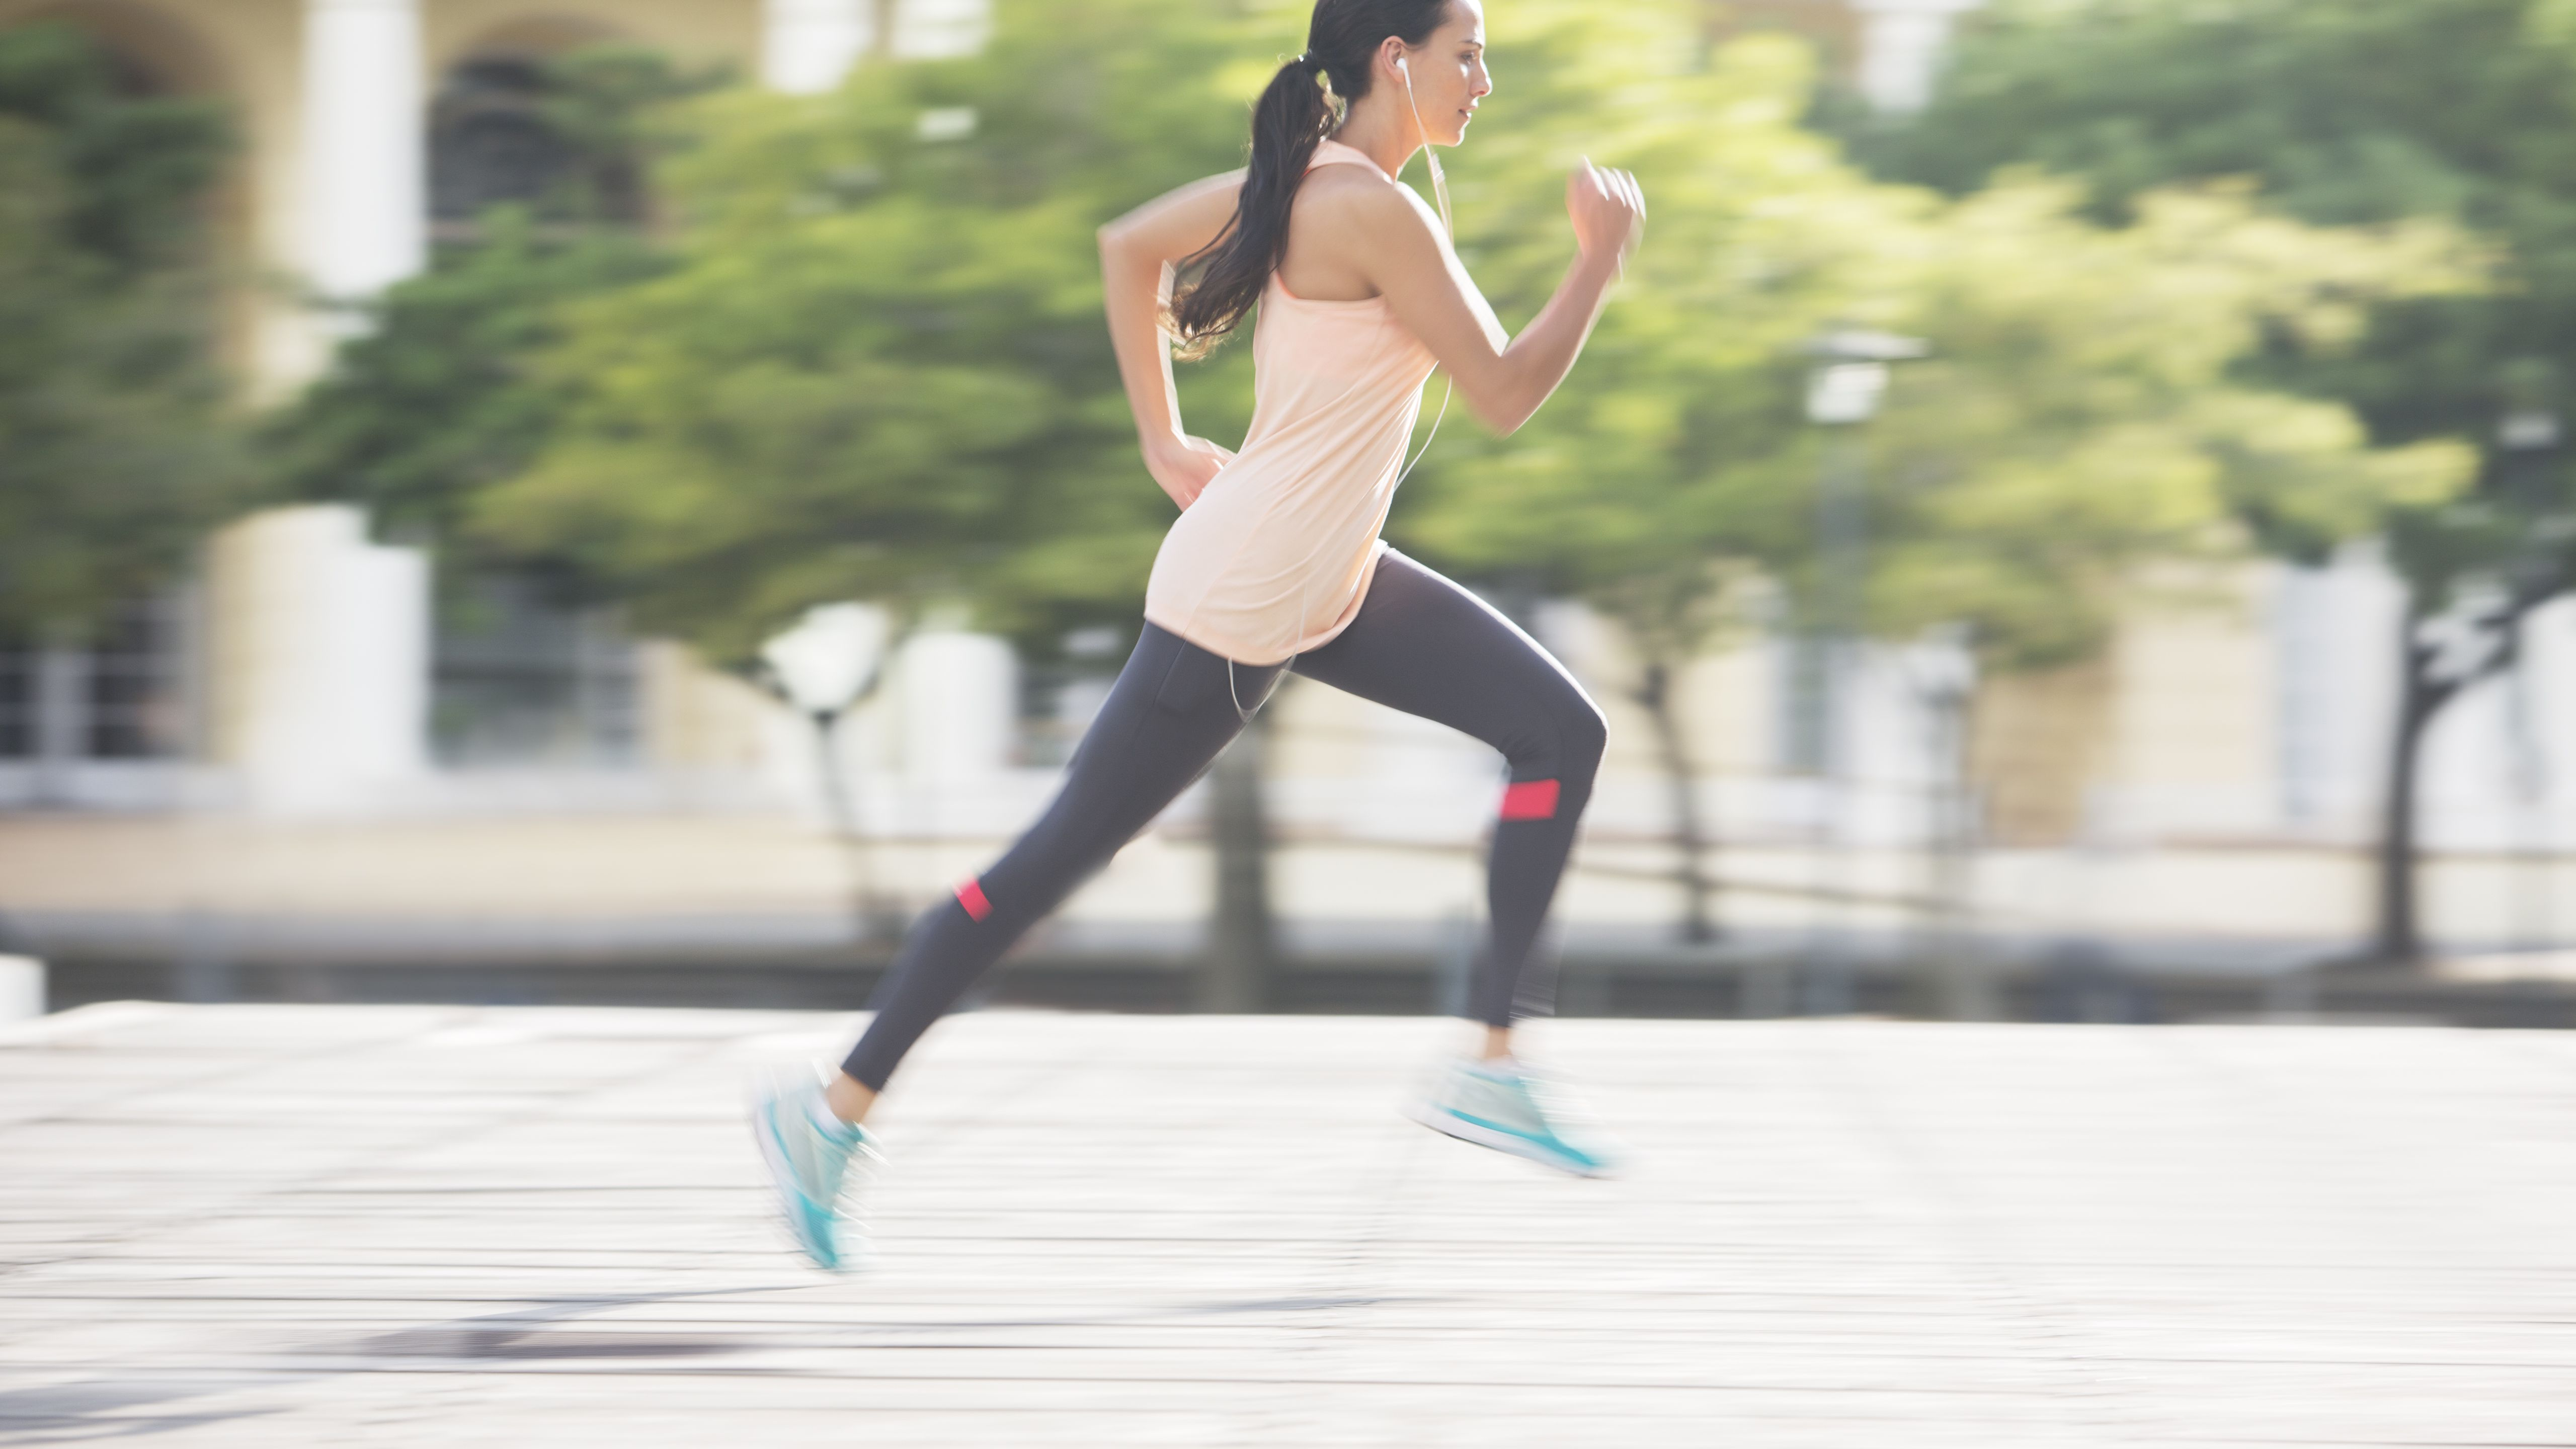 Why Do My Legs Feel Heavy When Running?